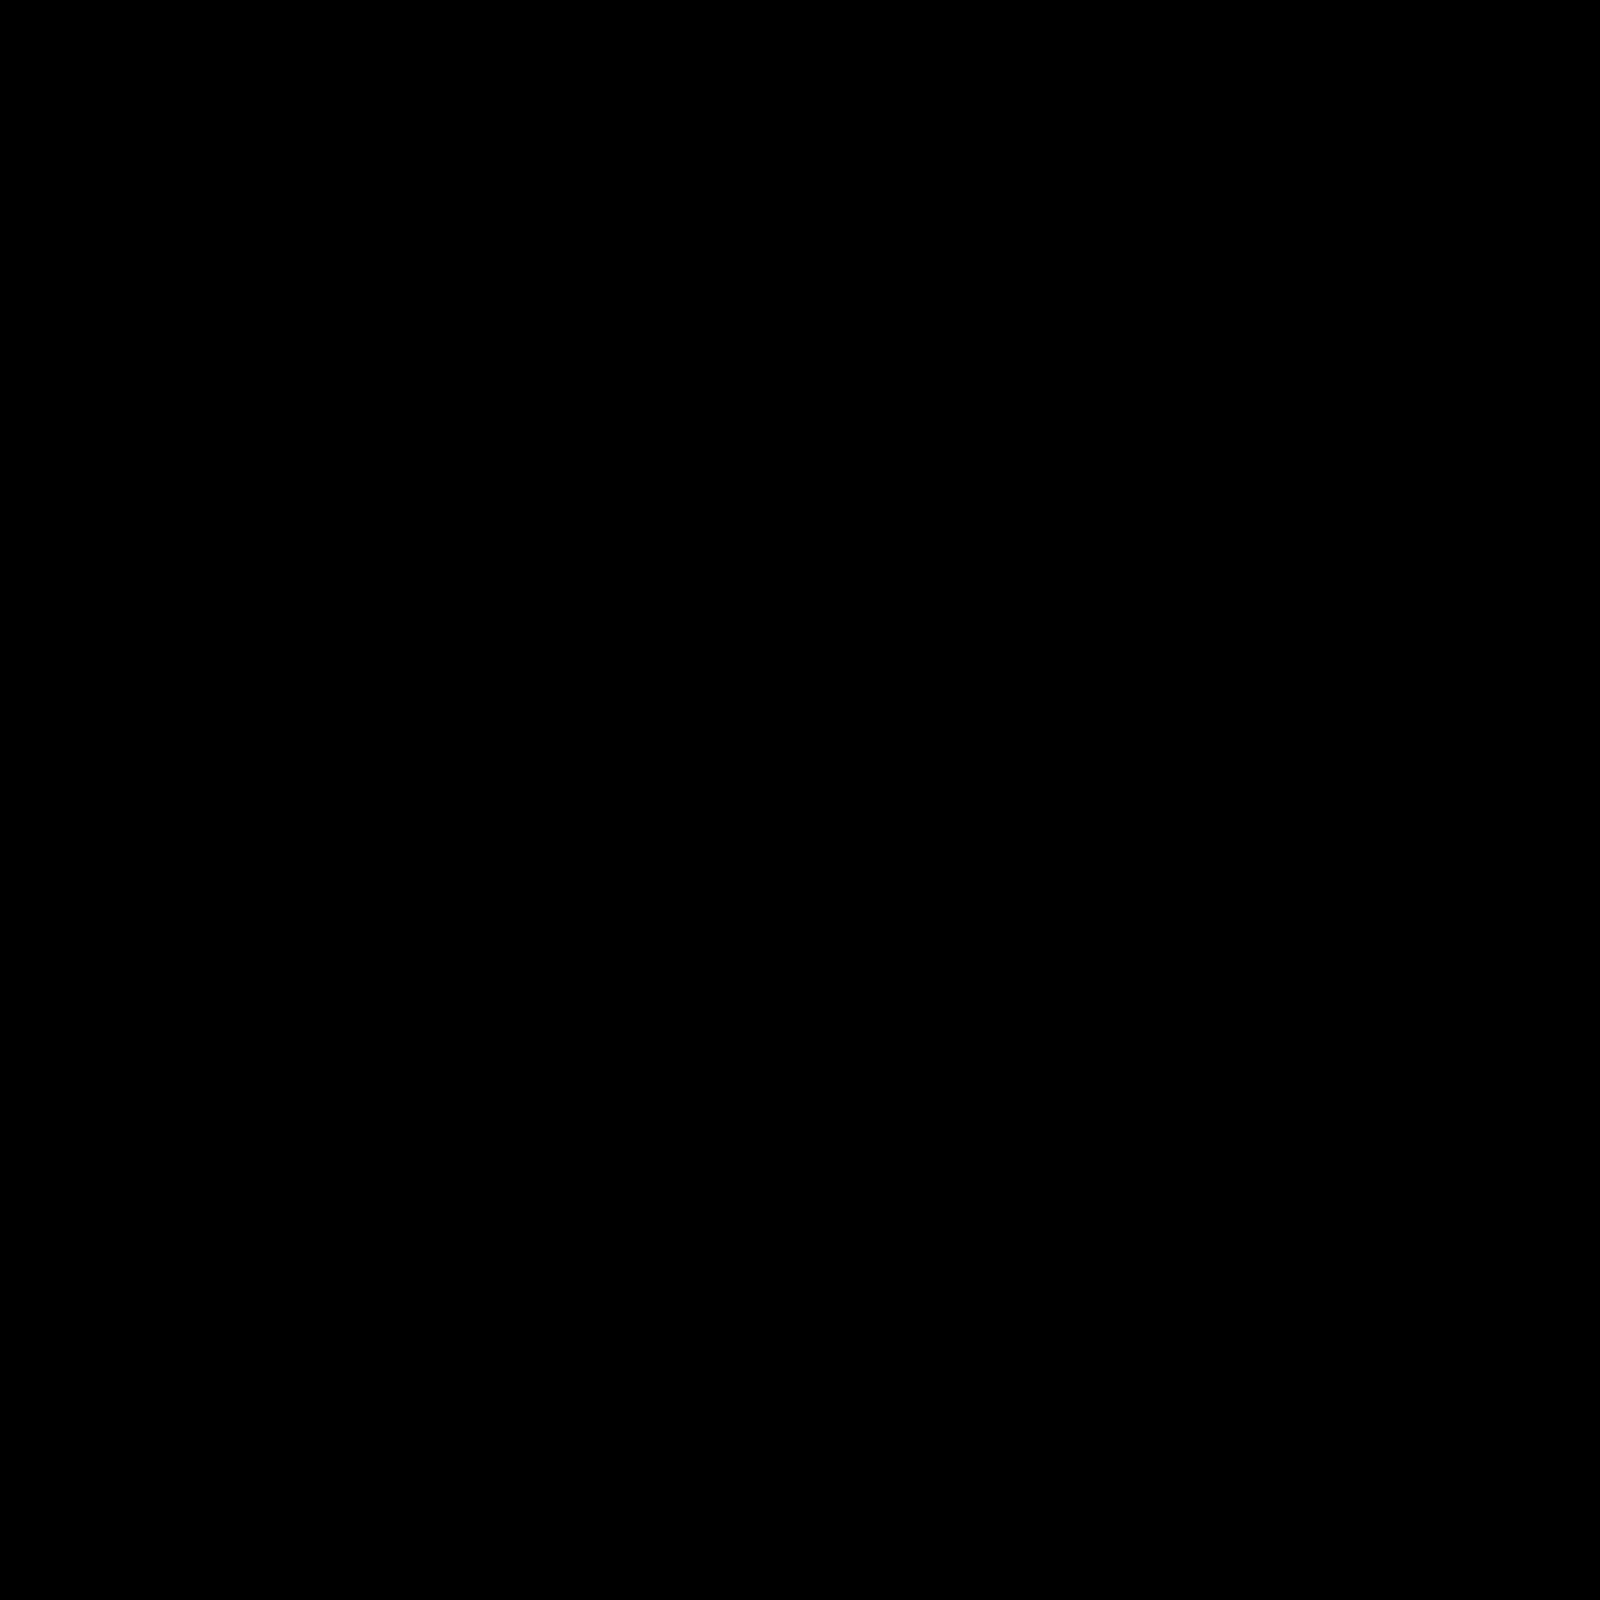 The Toast icon